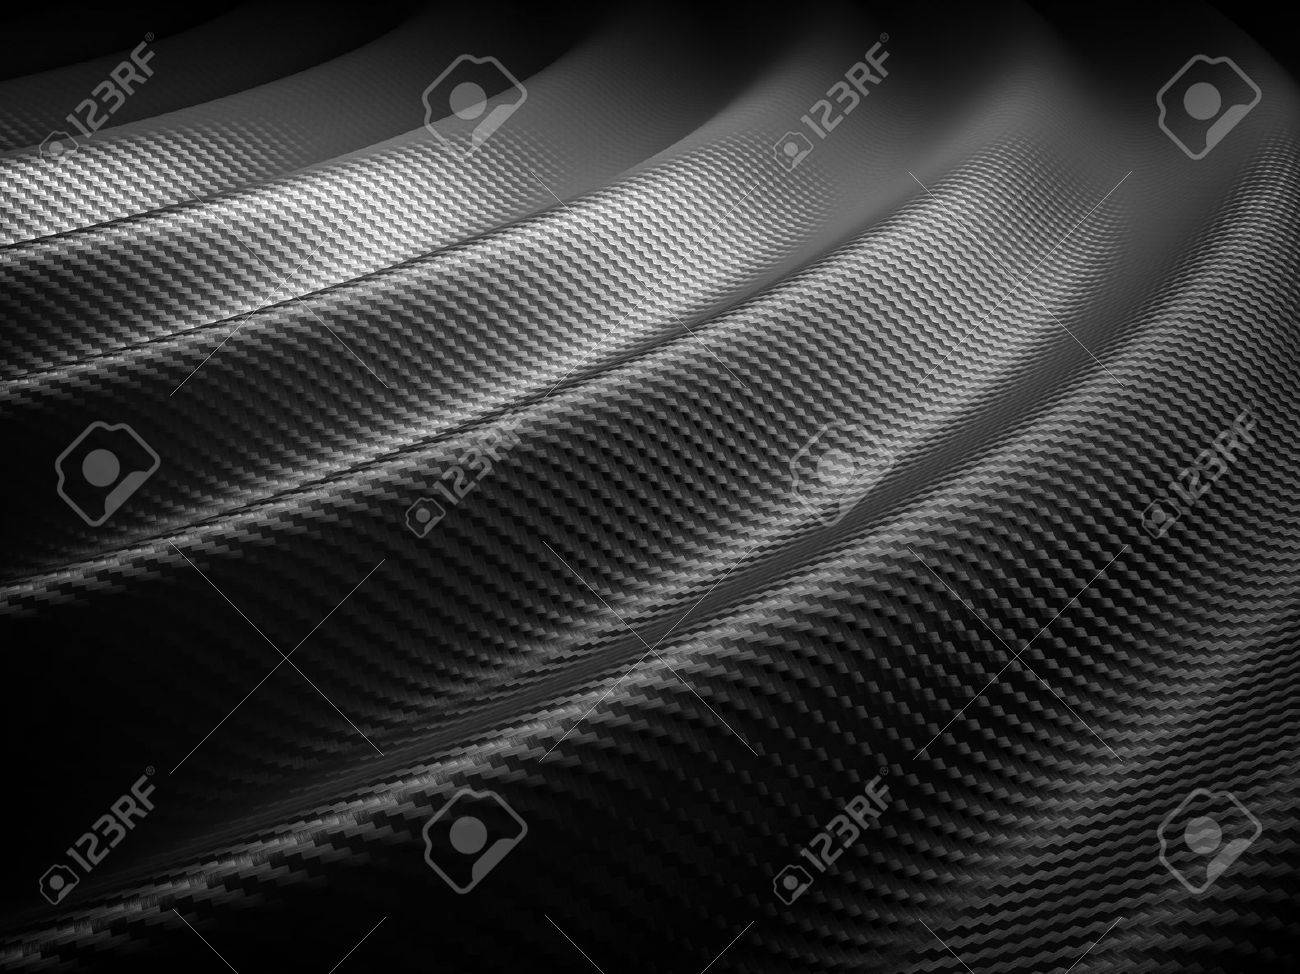 3d image of classic carbon fiber texture - 52851395